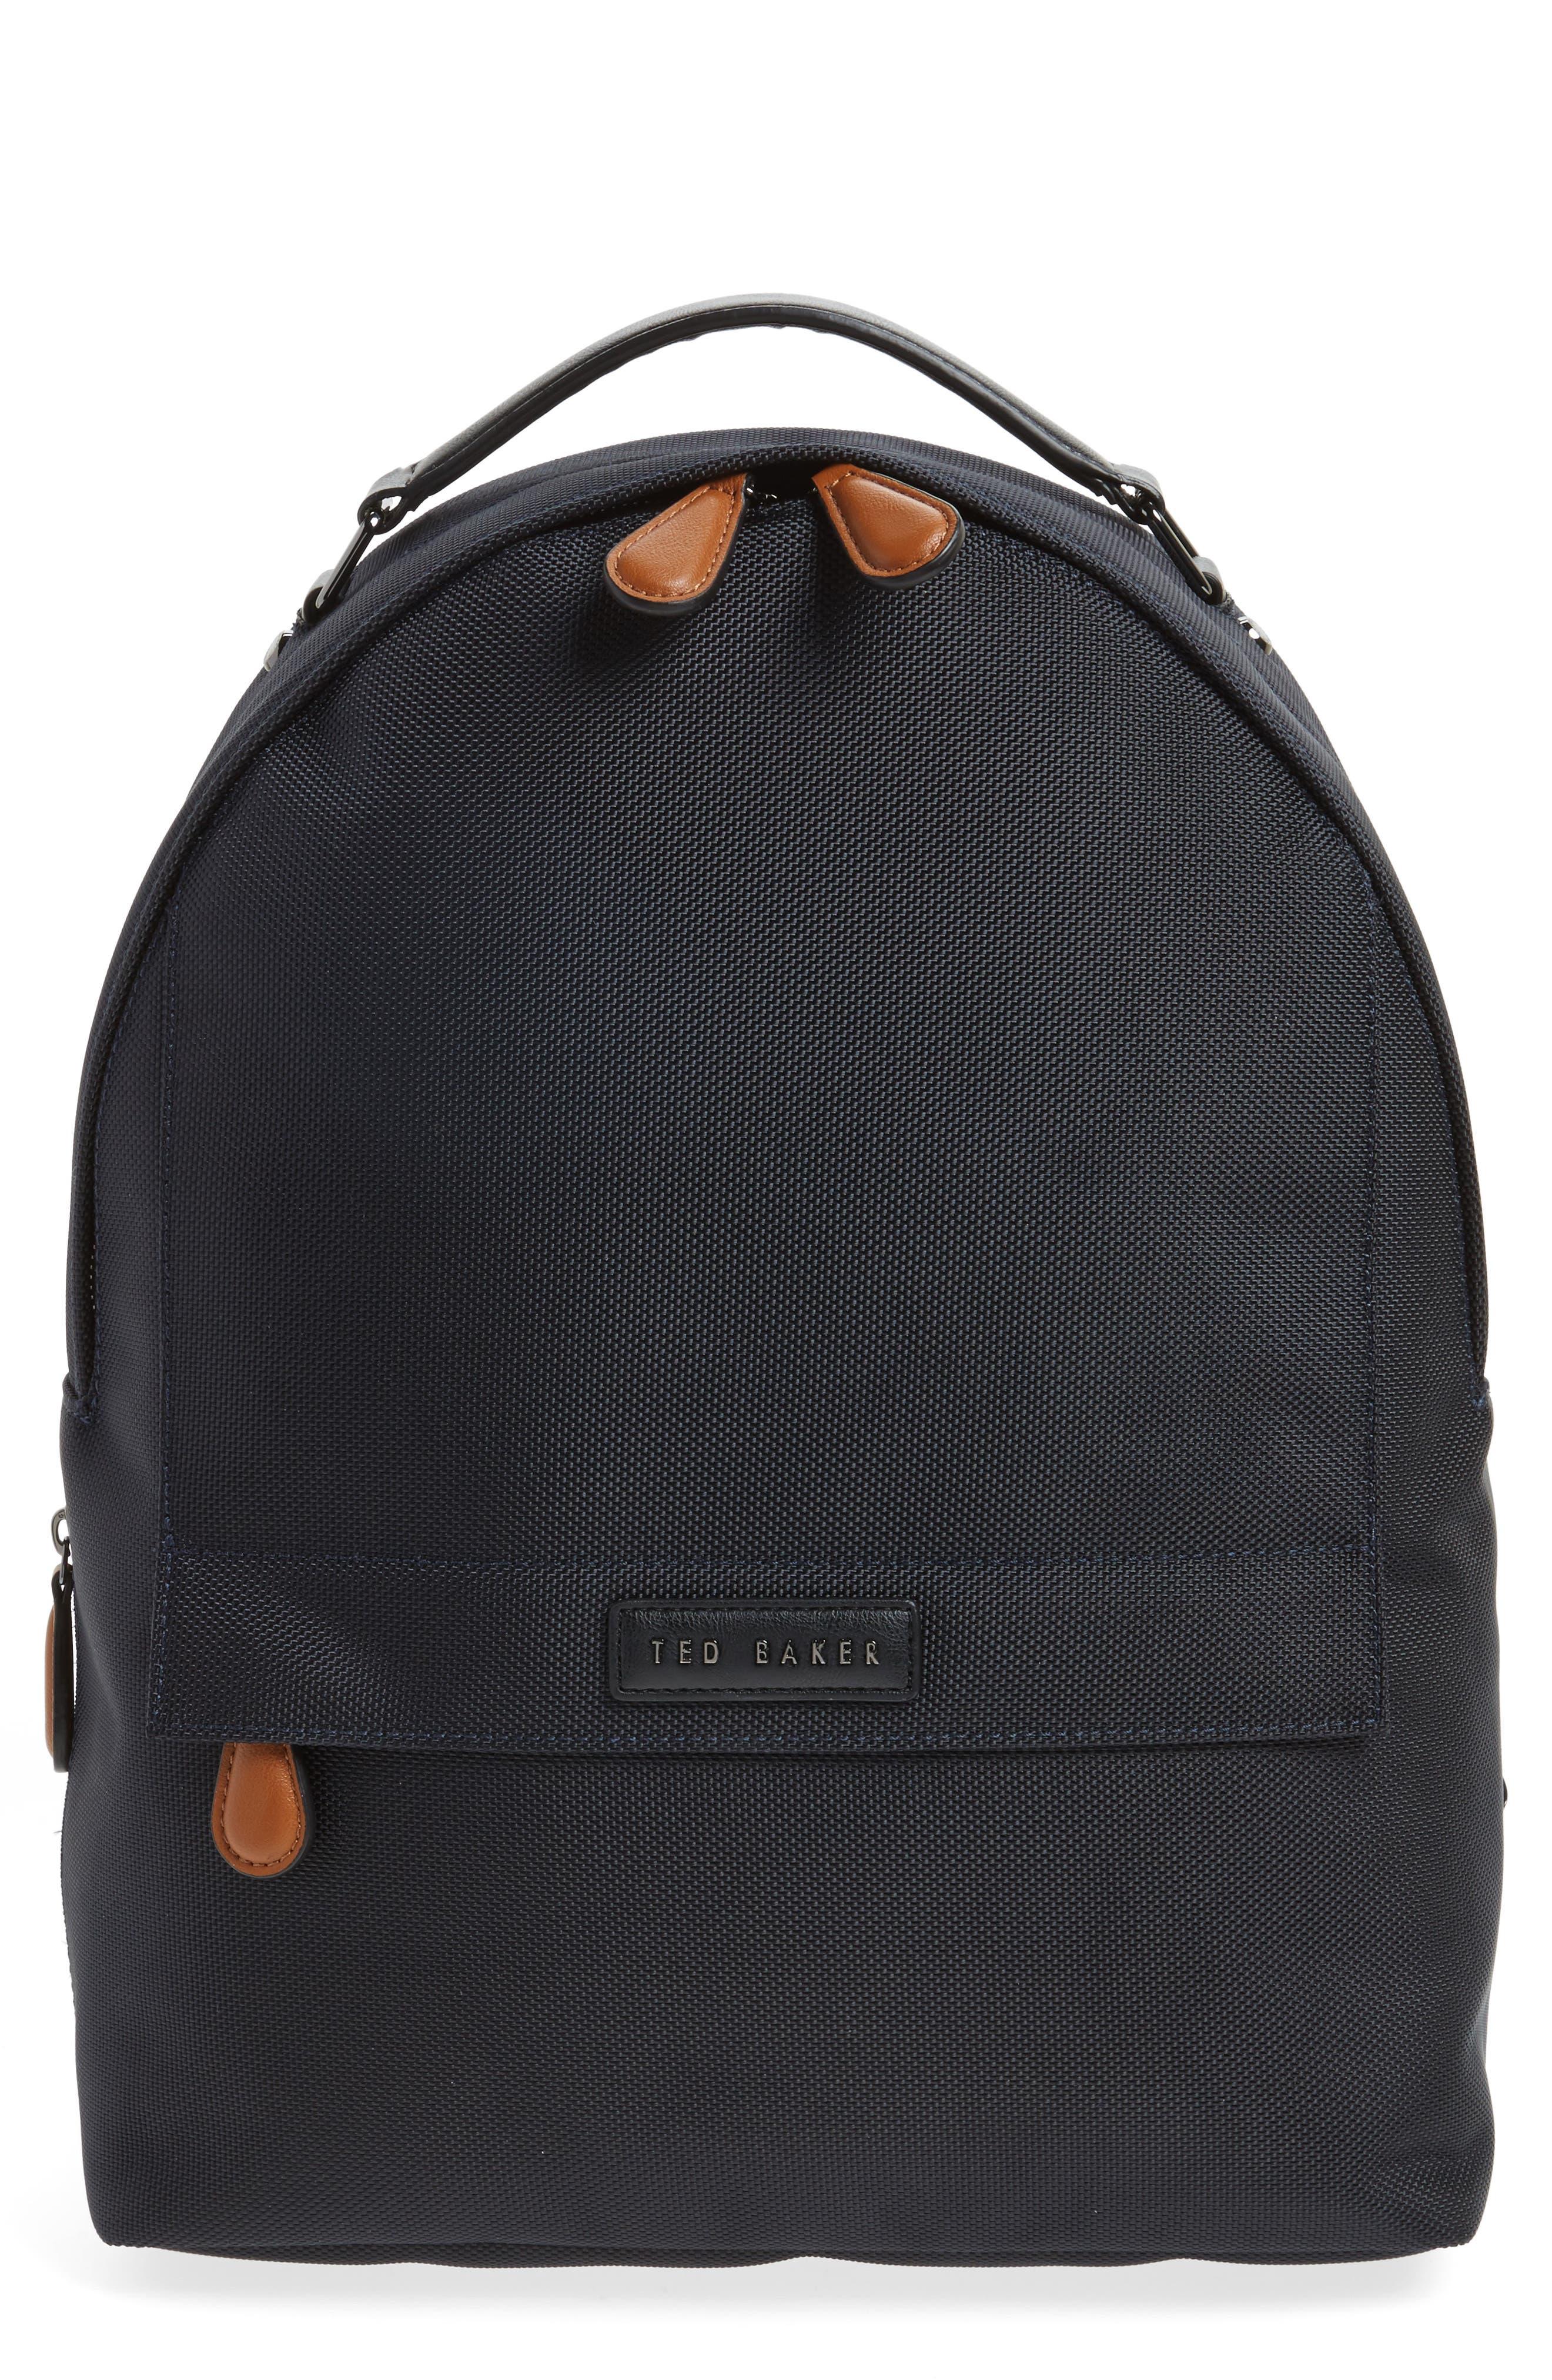 Solaris Backpack,                             Main thumbnail 1, color,                             410